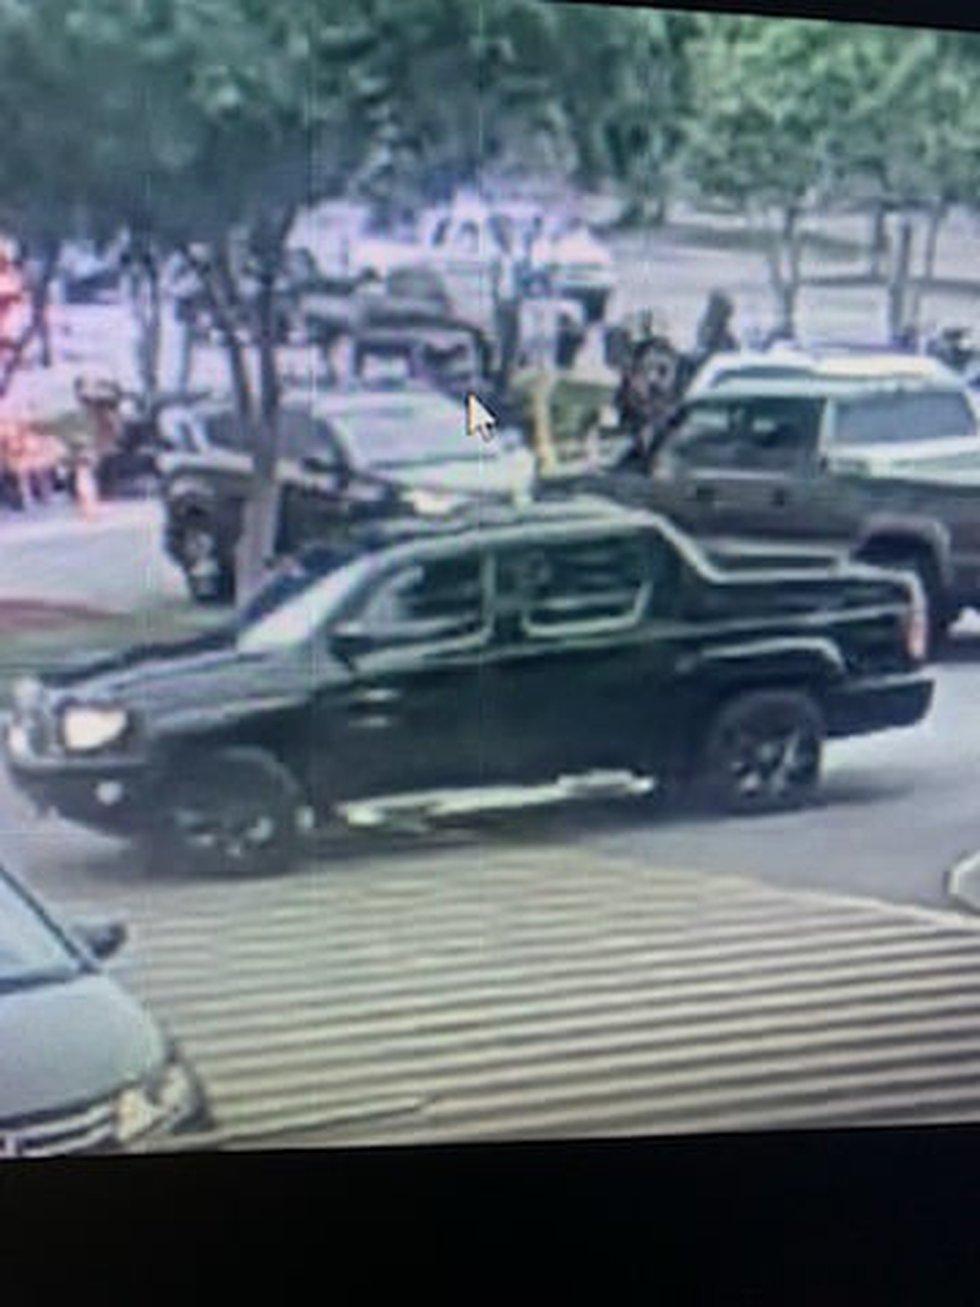 The suspect left the area in a black Honda Ridgeline truck.